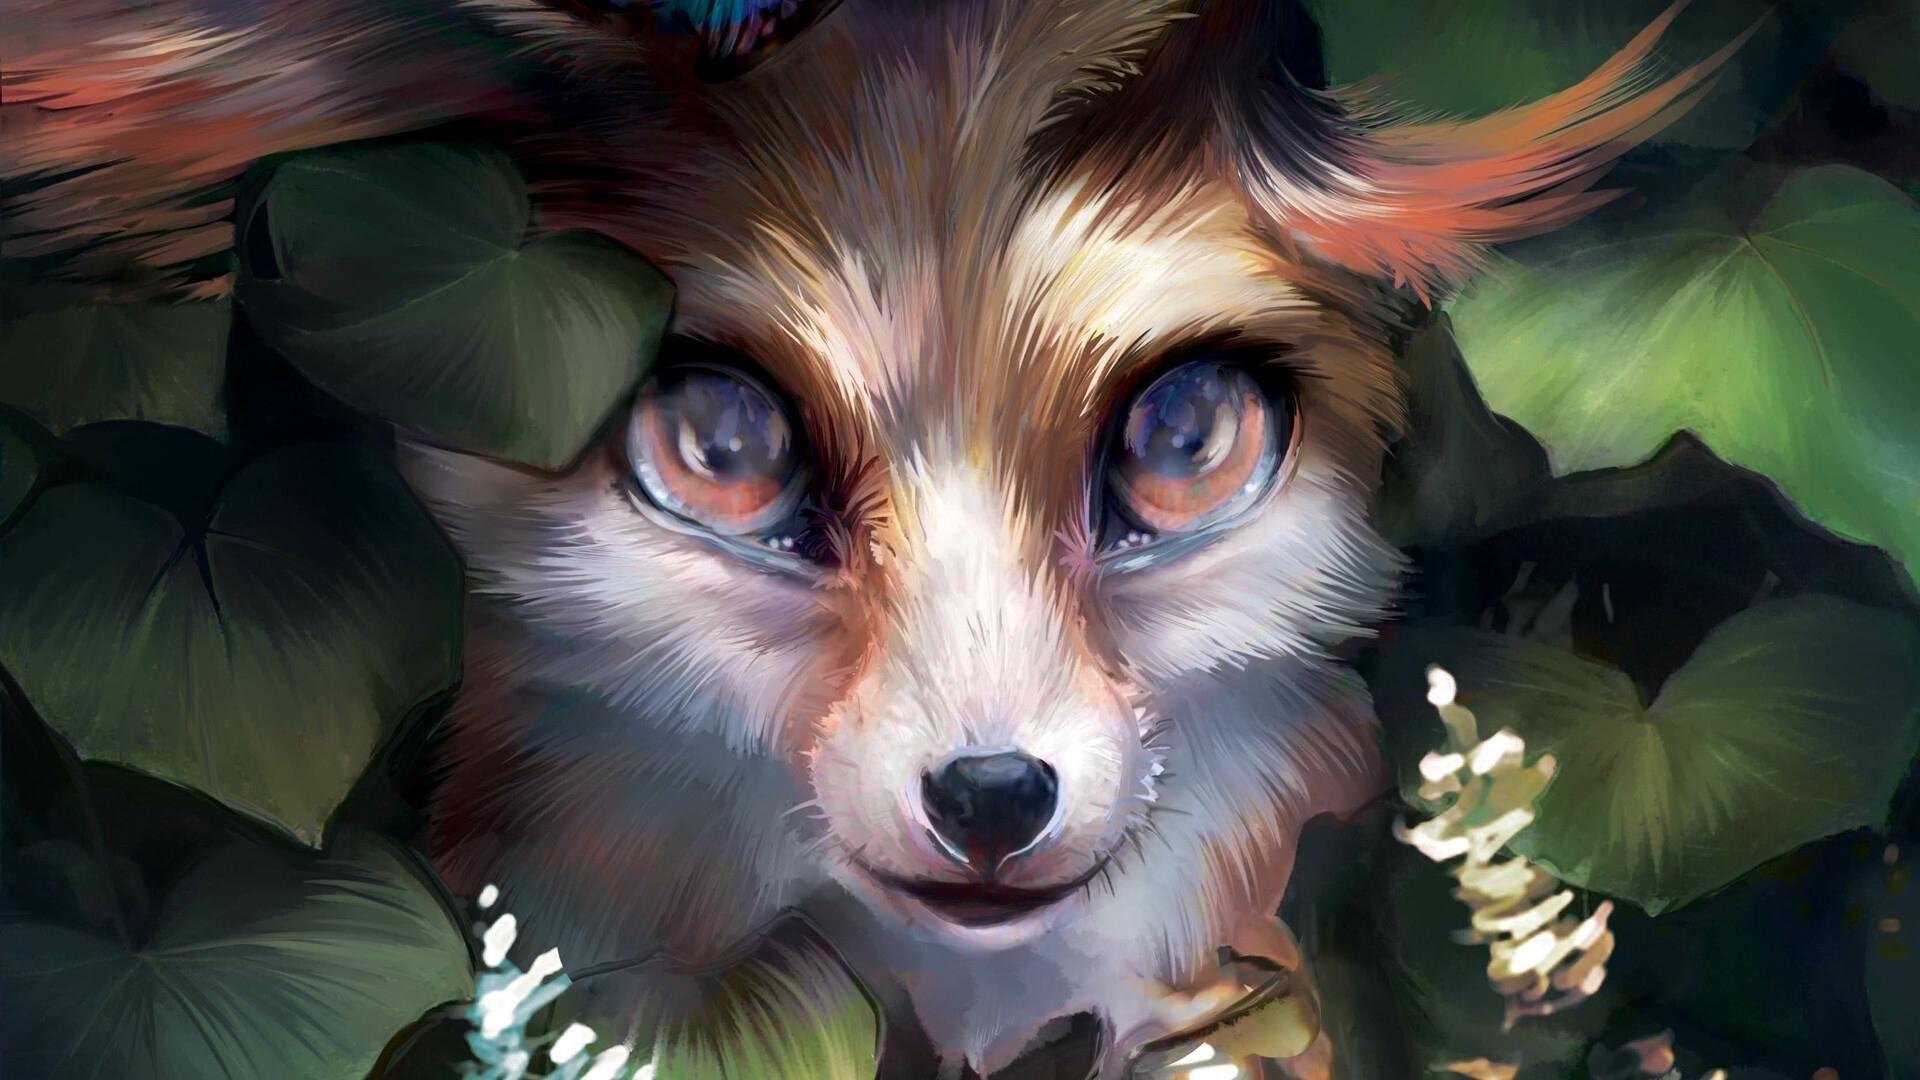 Fox Art Wallpaper theme